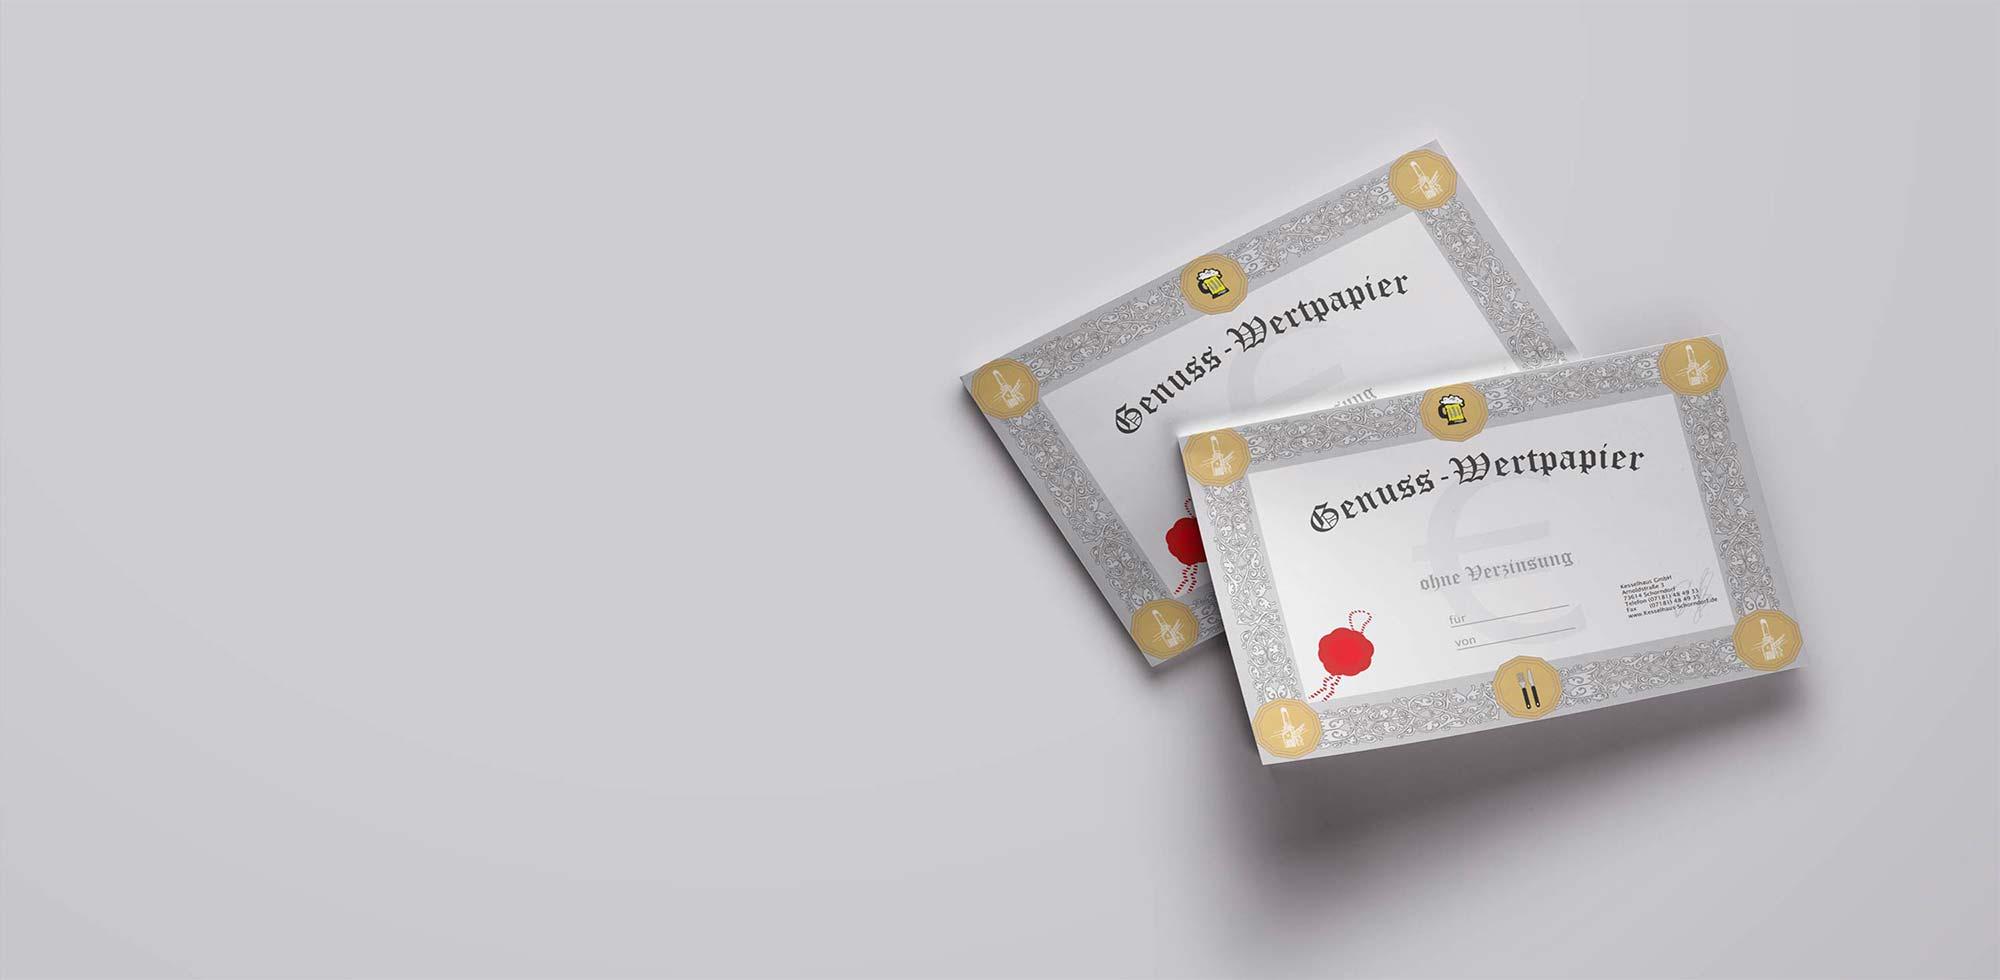 Printwerbung GIRAFFIKKA 73642 Welzheim Rudersberger Str. 14